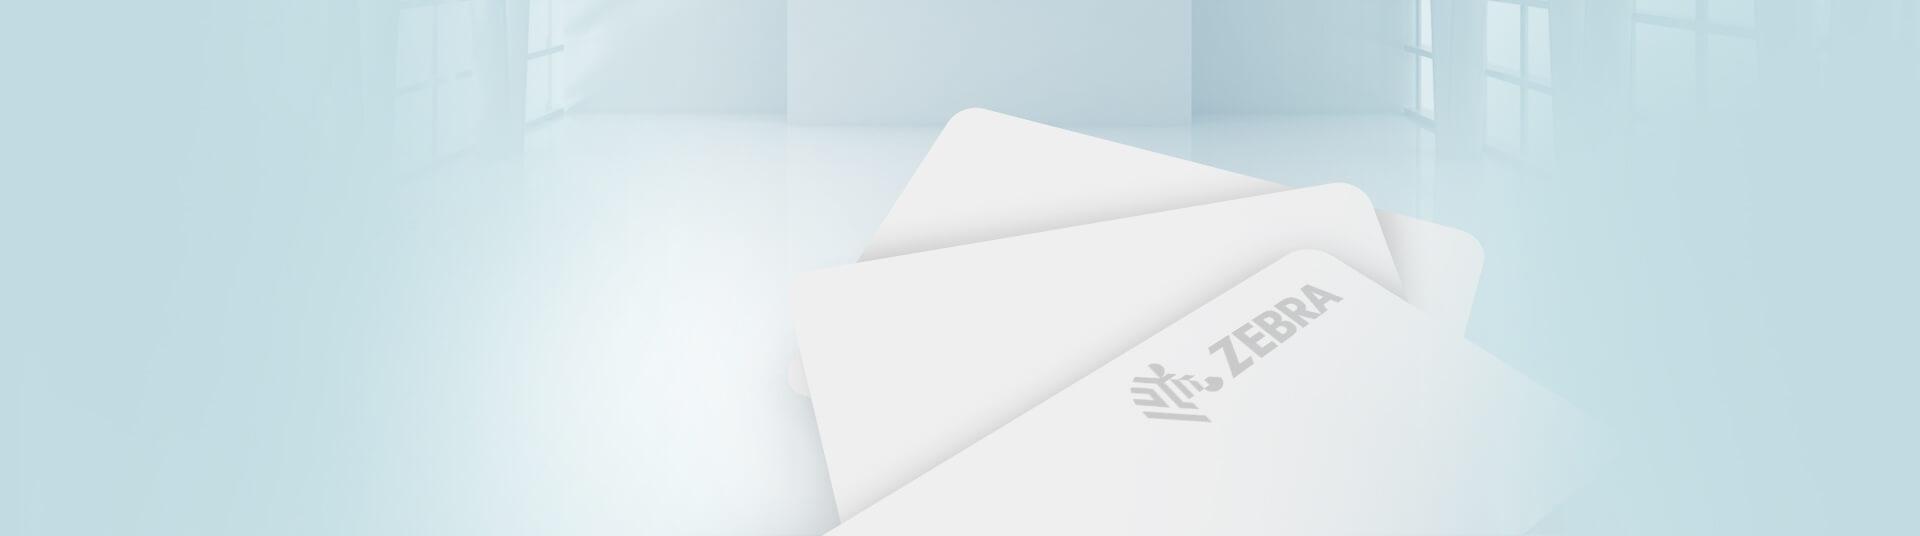 Zebra Blank Cards